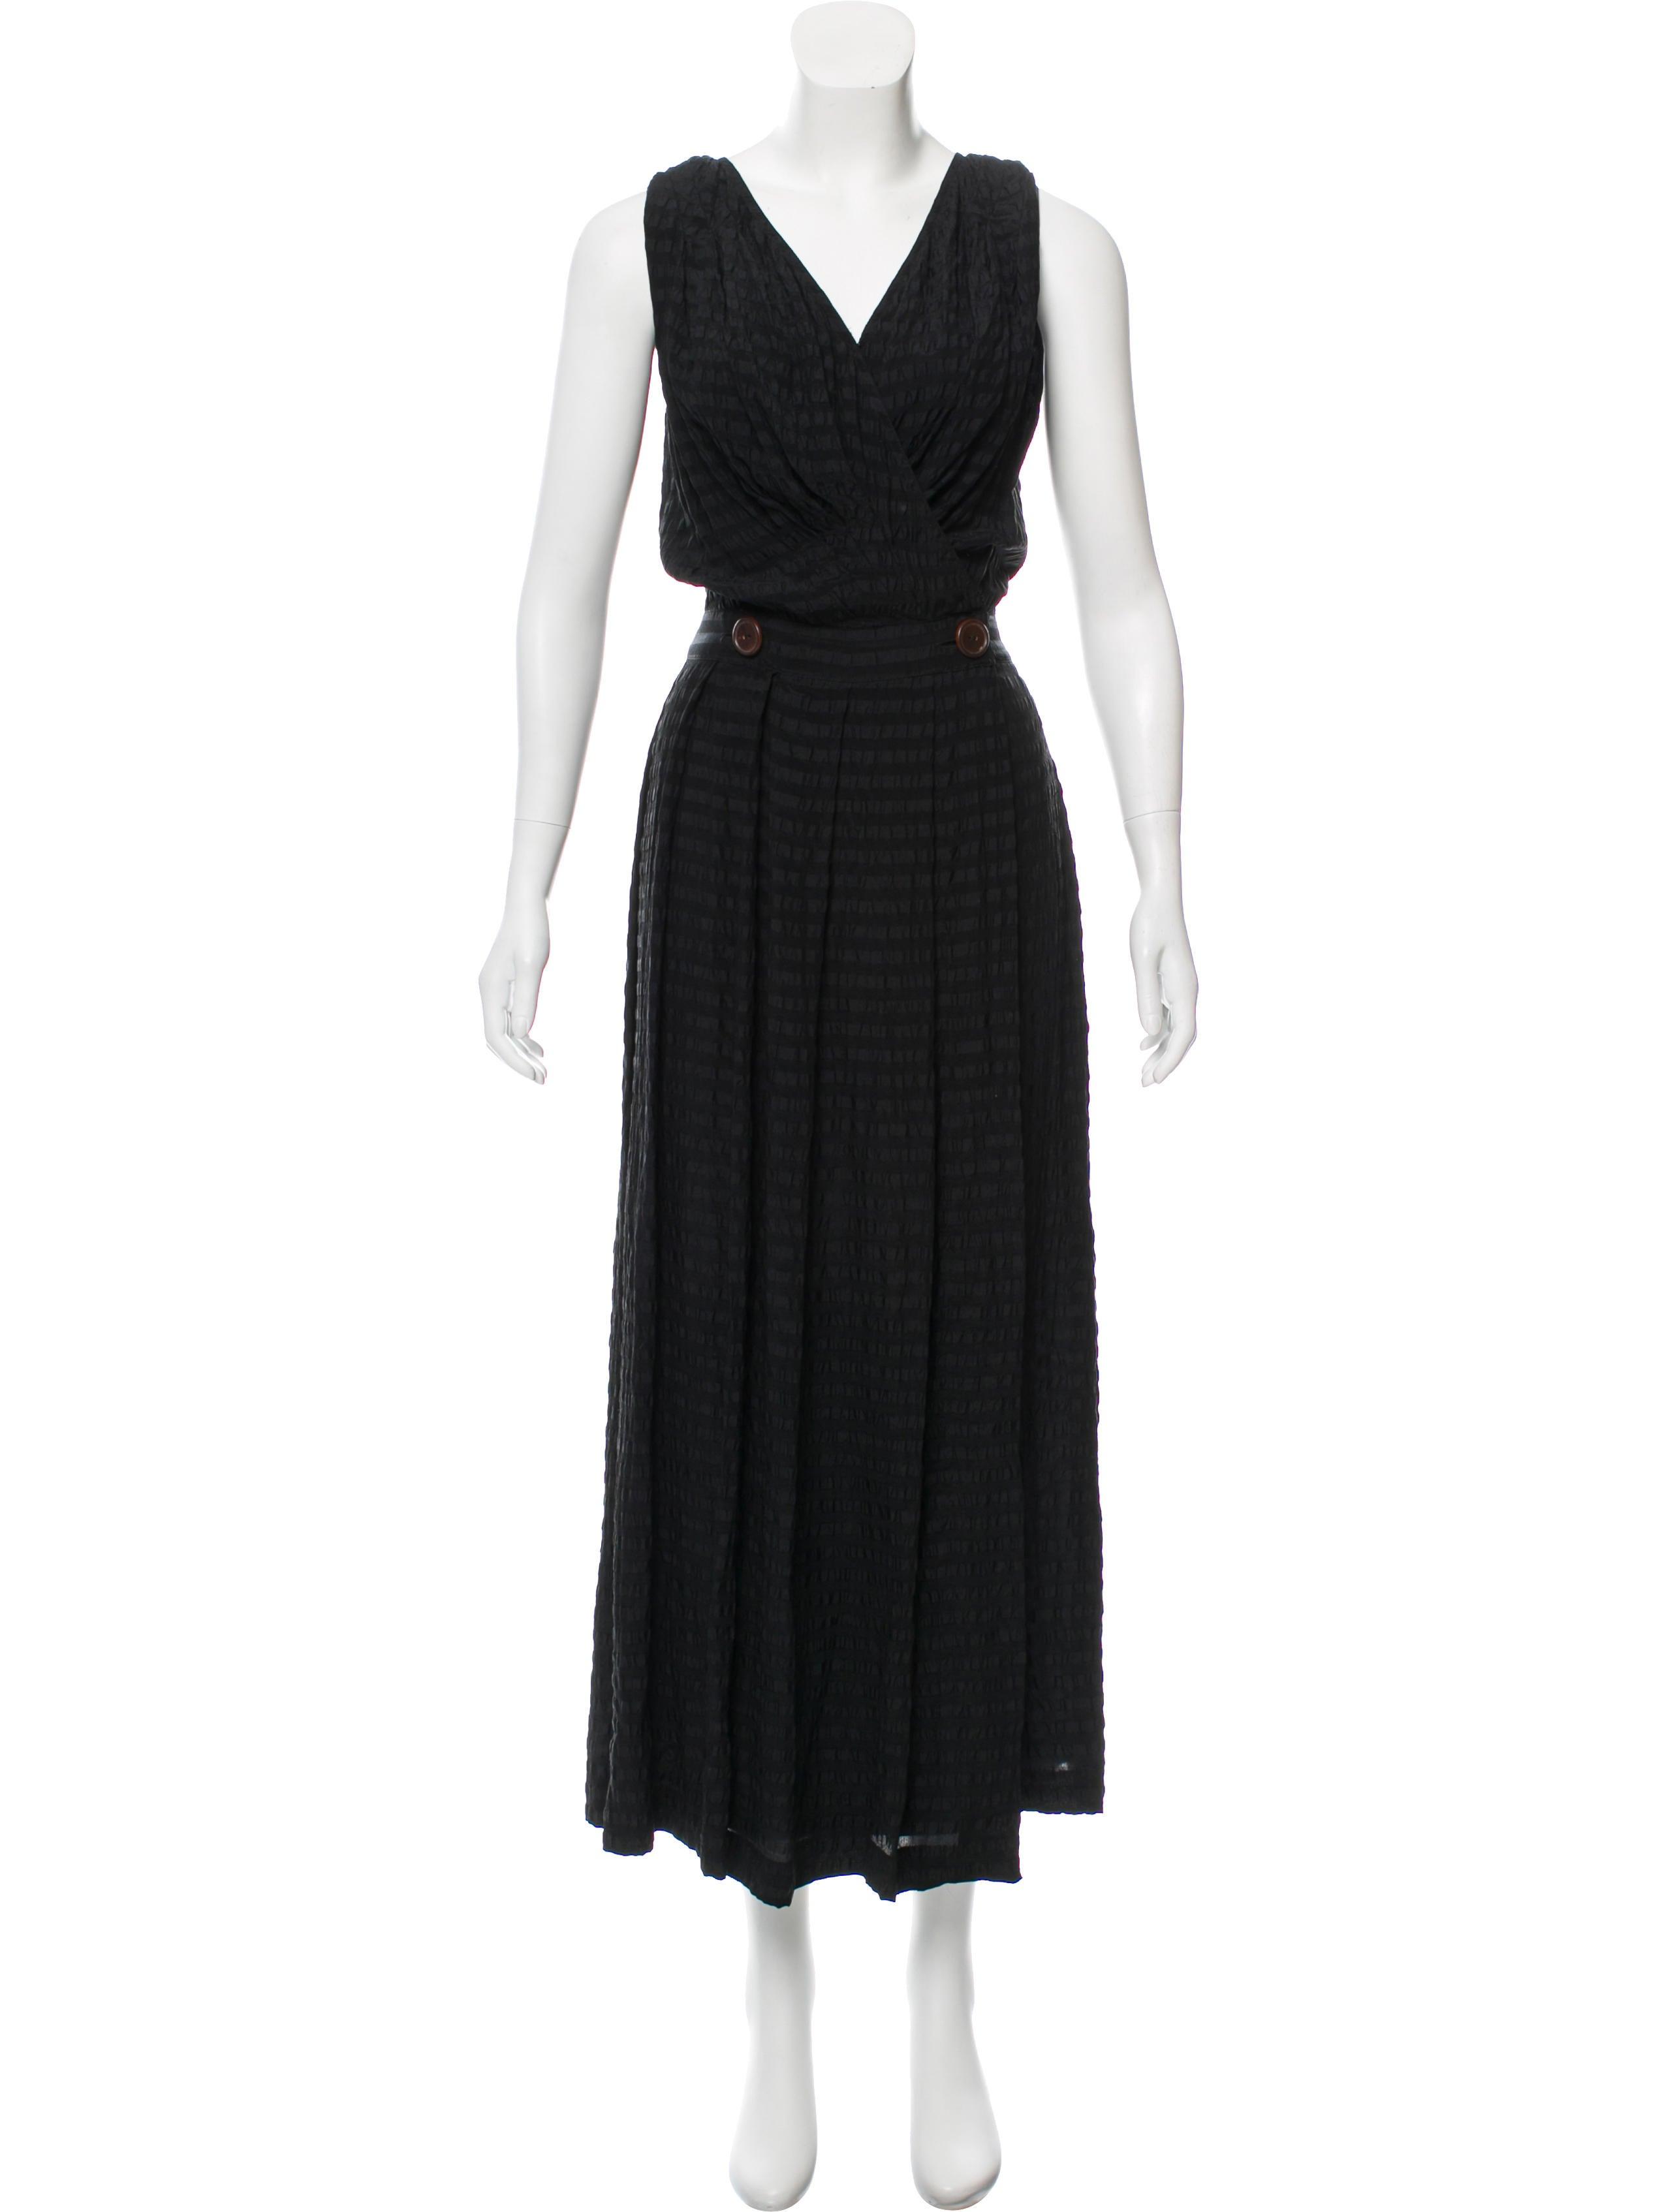 Carmen Marc Valvo Silk Seersucker Dress - Clothing - CAE20919 | The ...